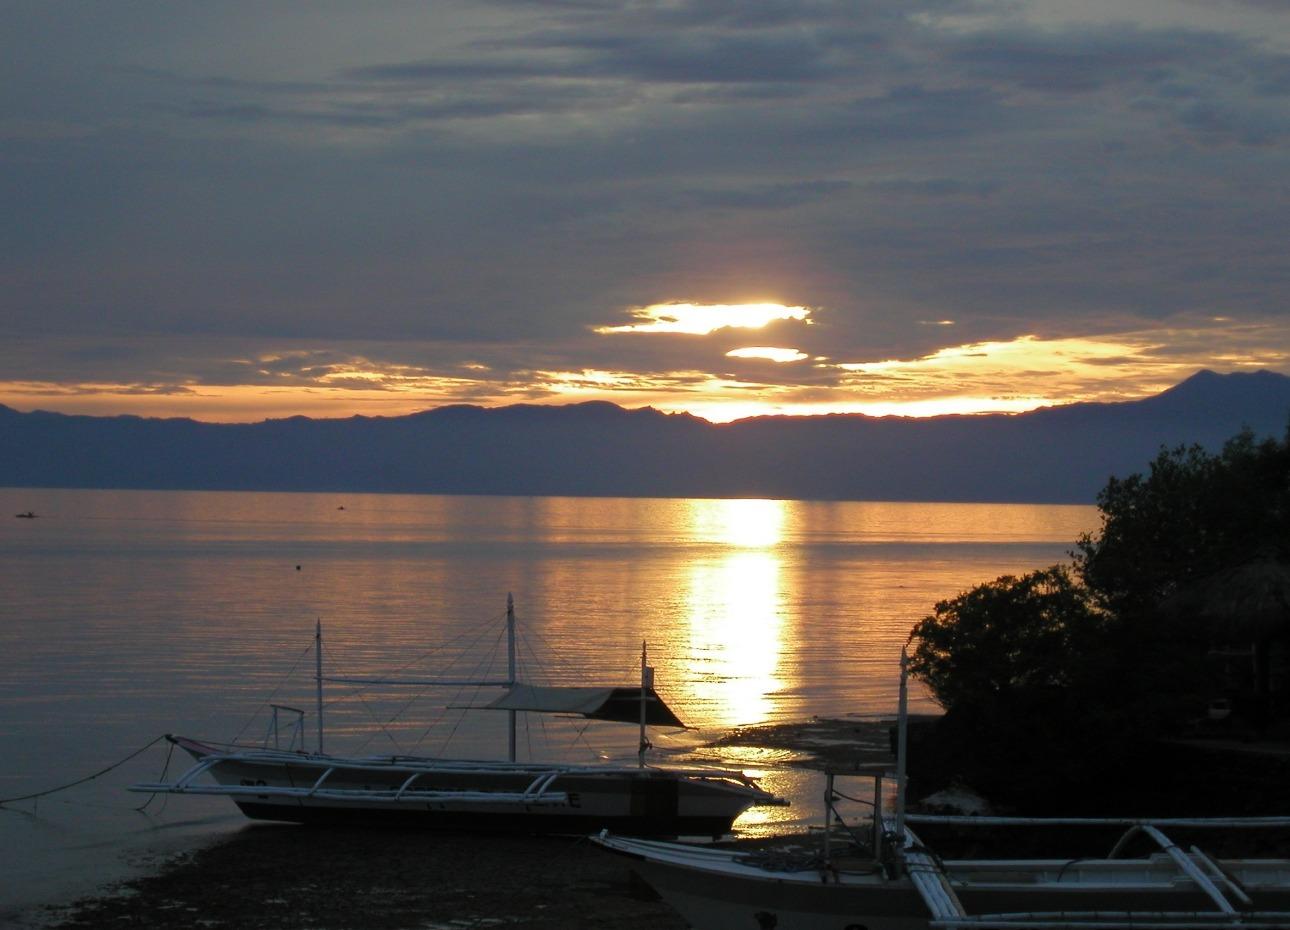 Philippines, Moalboal Magic Island, Dive Resort, Cottages, Sunset, image,